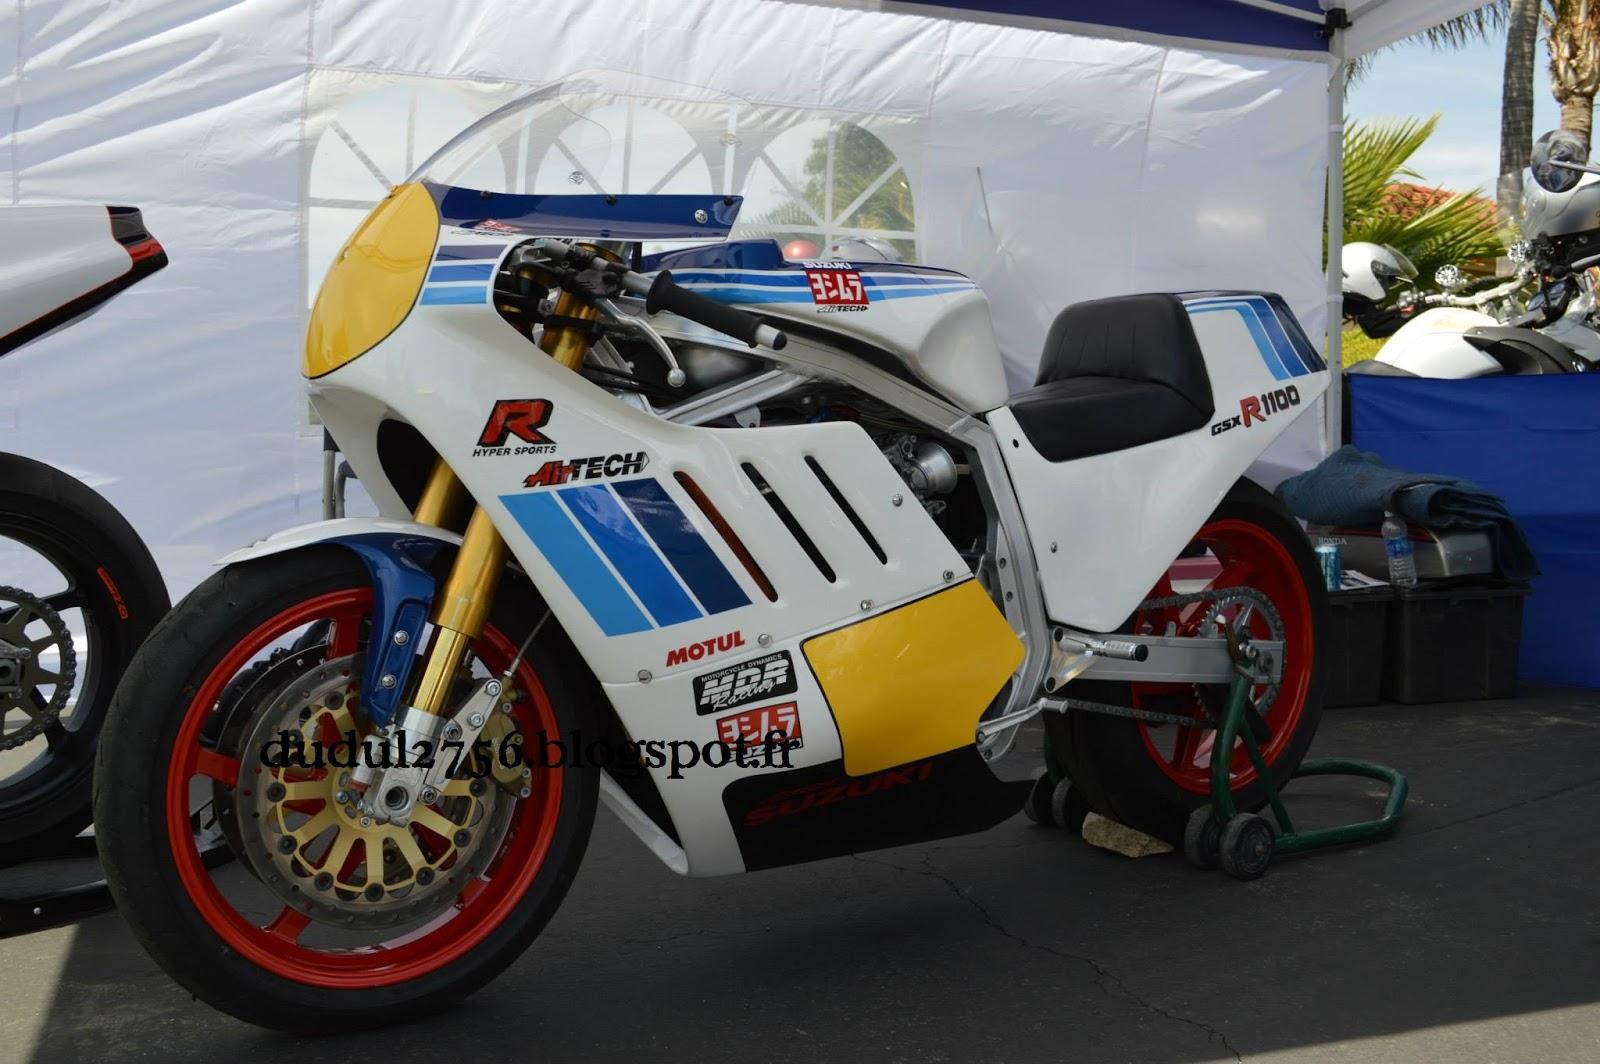 Suzuki GSX-R Slabside 750 (85-87) et 1100 (86-88) - Page 39 11334064_953977677987032_5137212325346996164_o